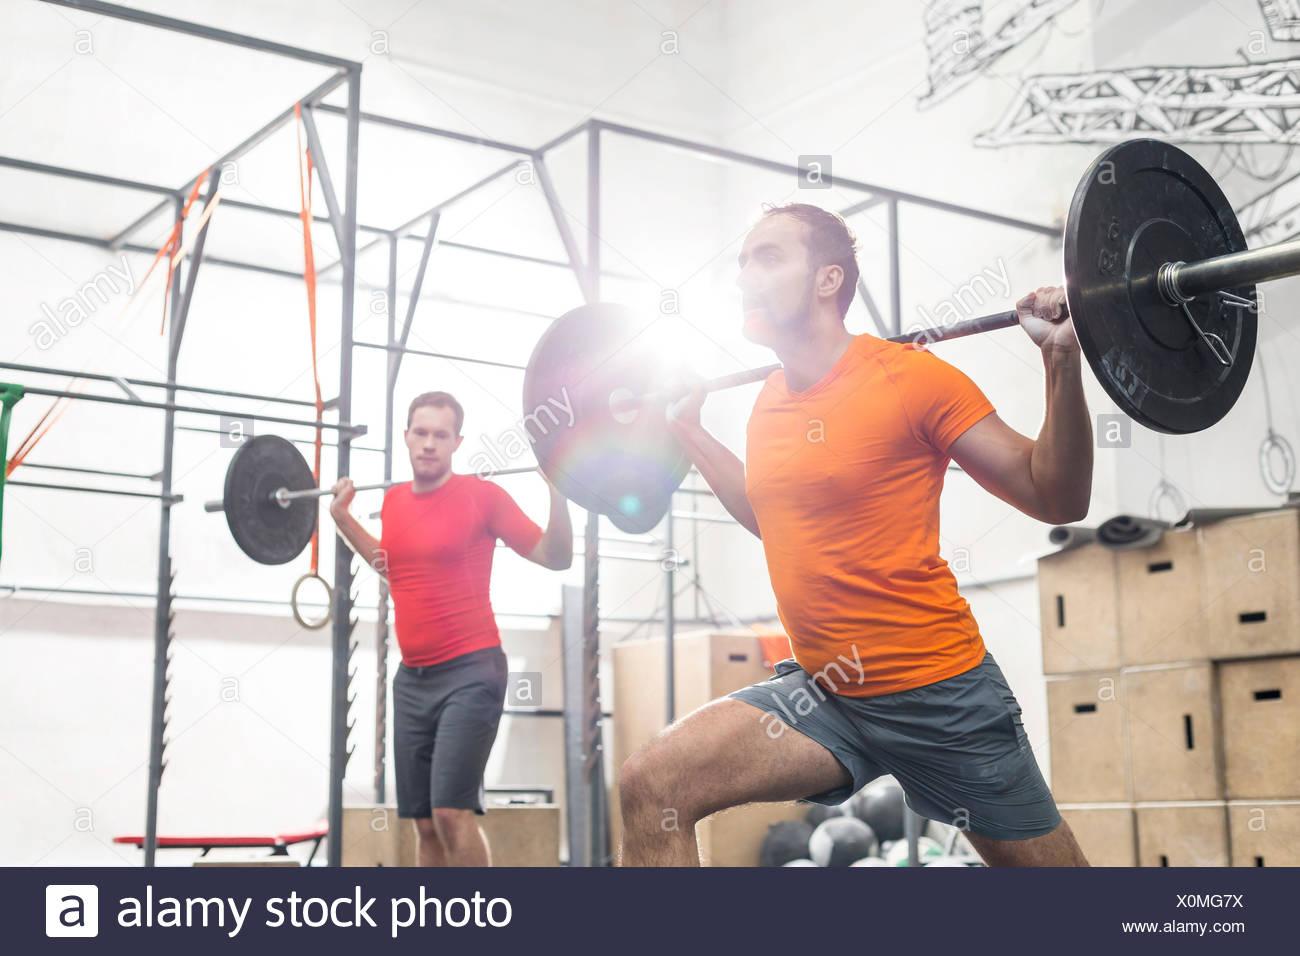 Men lifting barbells in crossfit gym - Stock Image